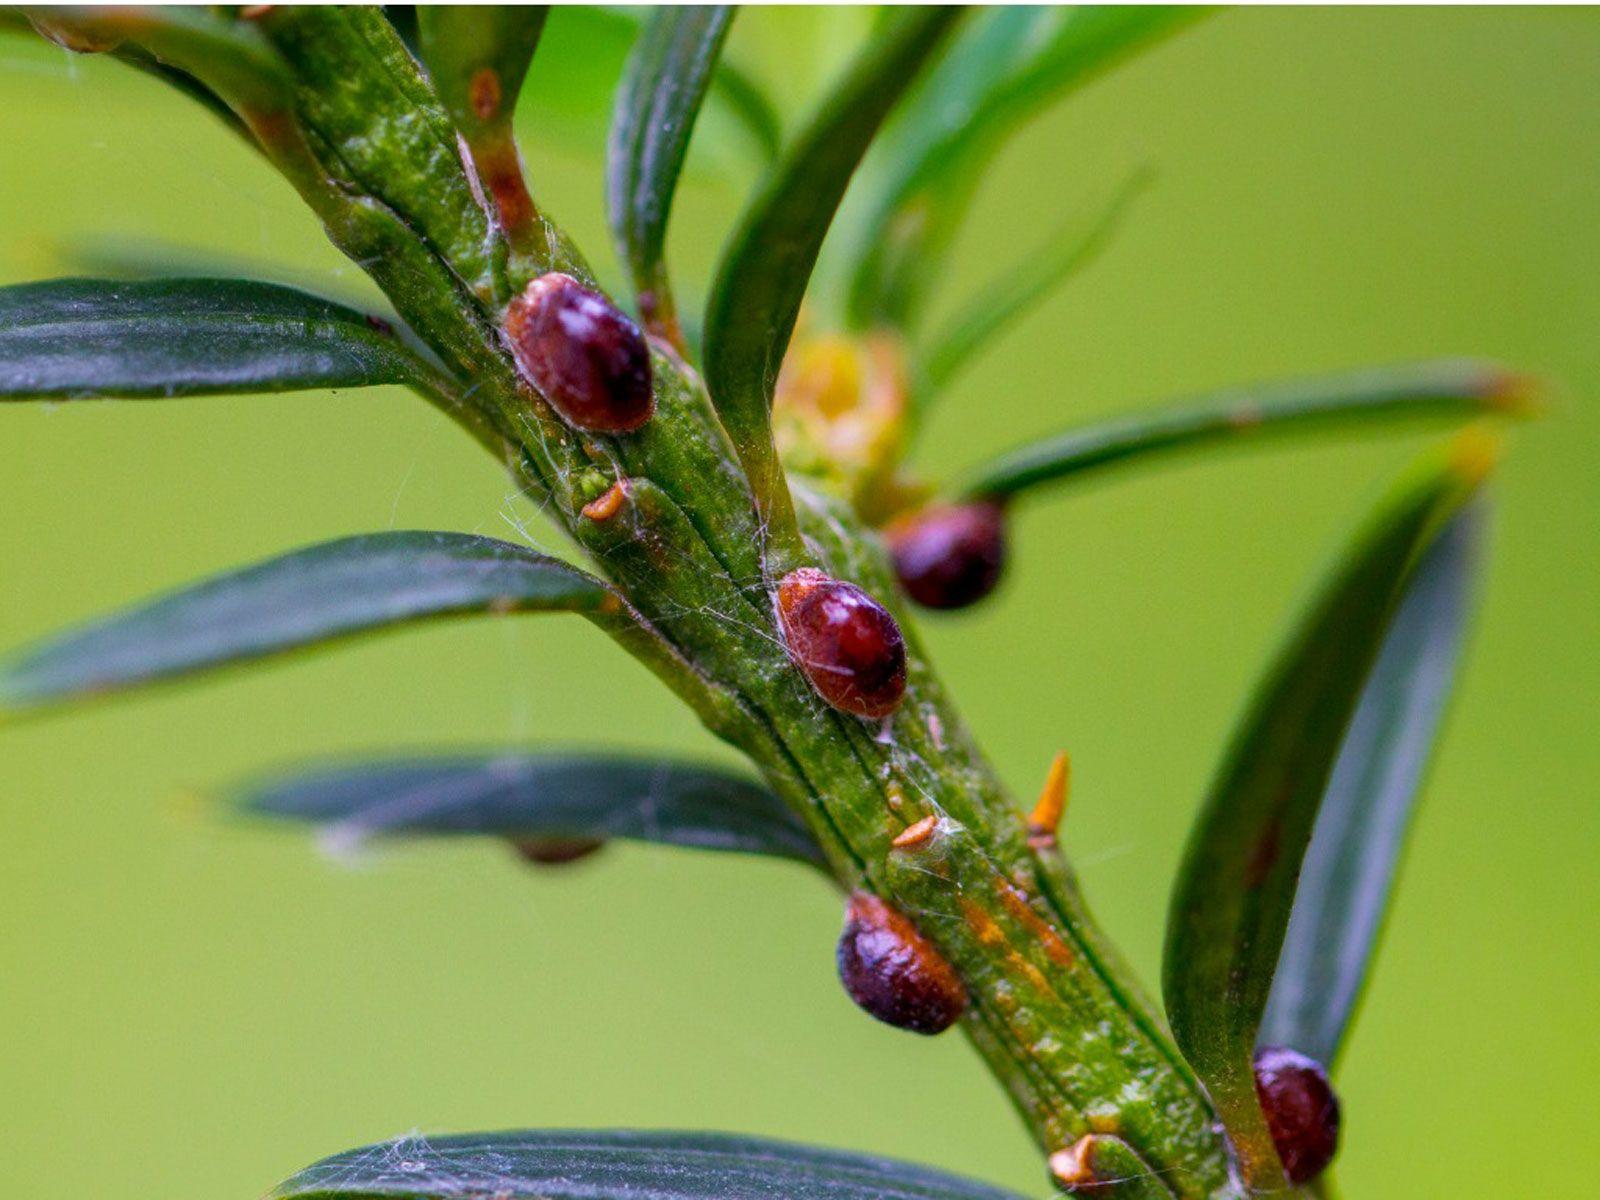 797e68ec687c2d220362f53f7df82bec - How To Get Rid Of Scale Insects On Citrus Trees